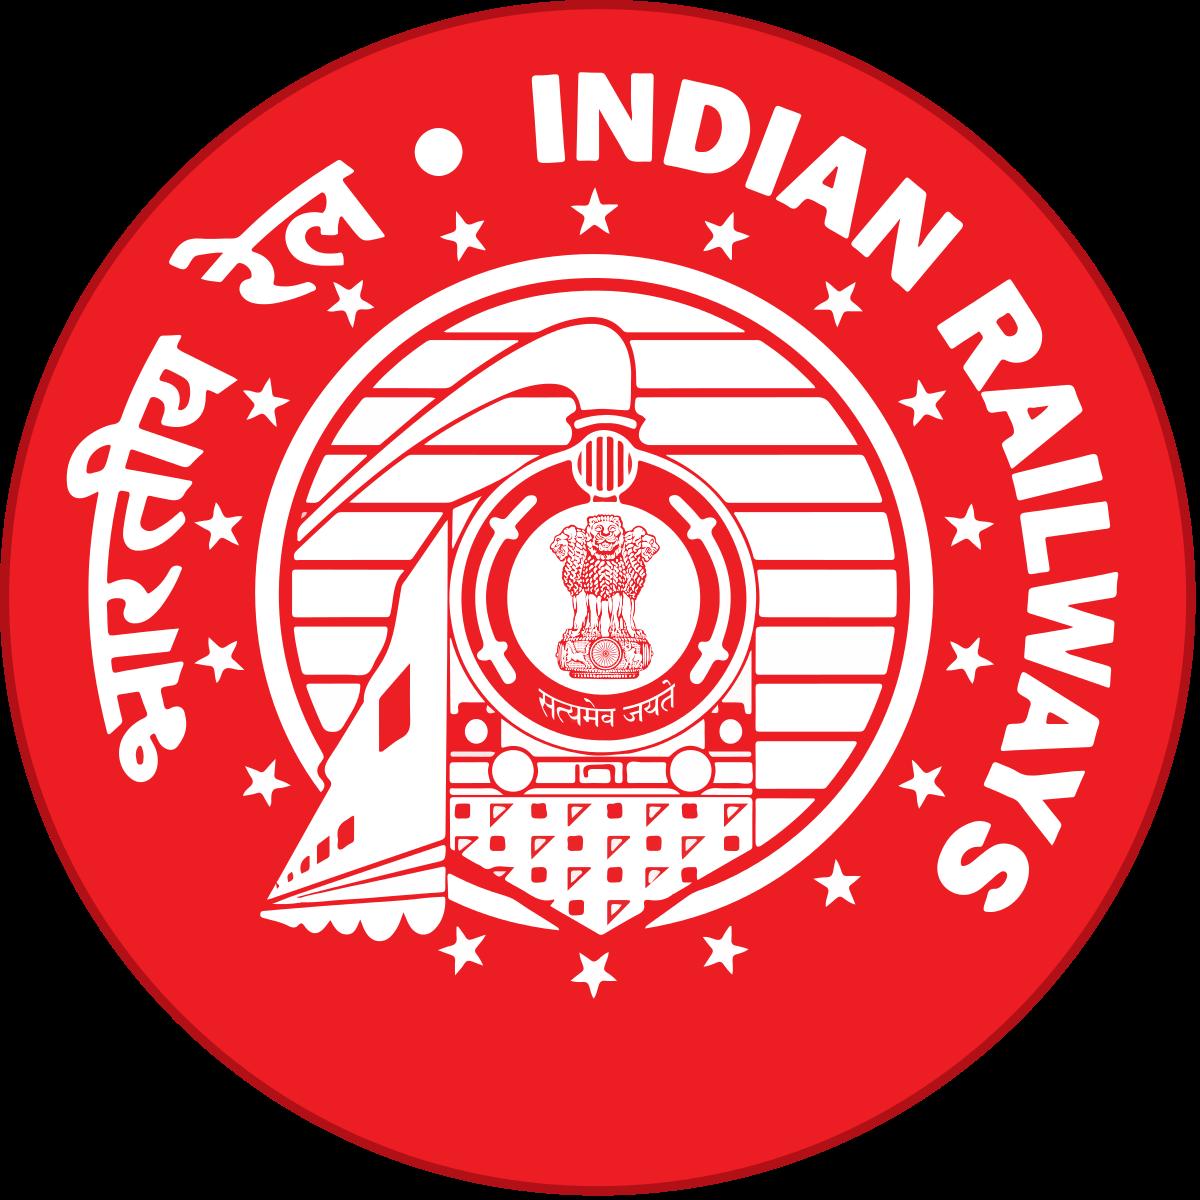 Indian Railway Recruitment Station Master/ Goods Guard